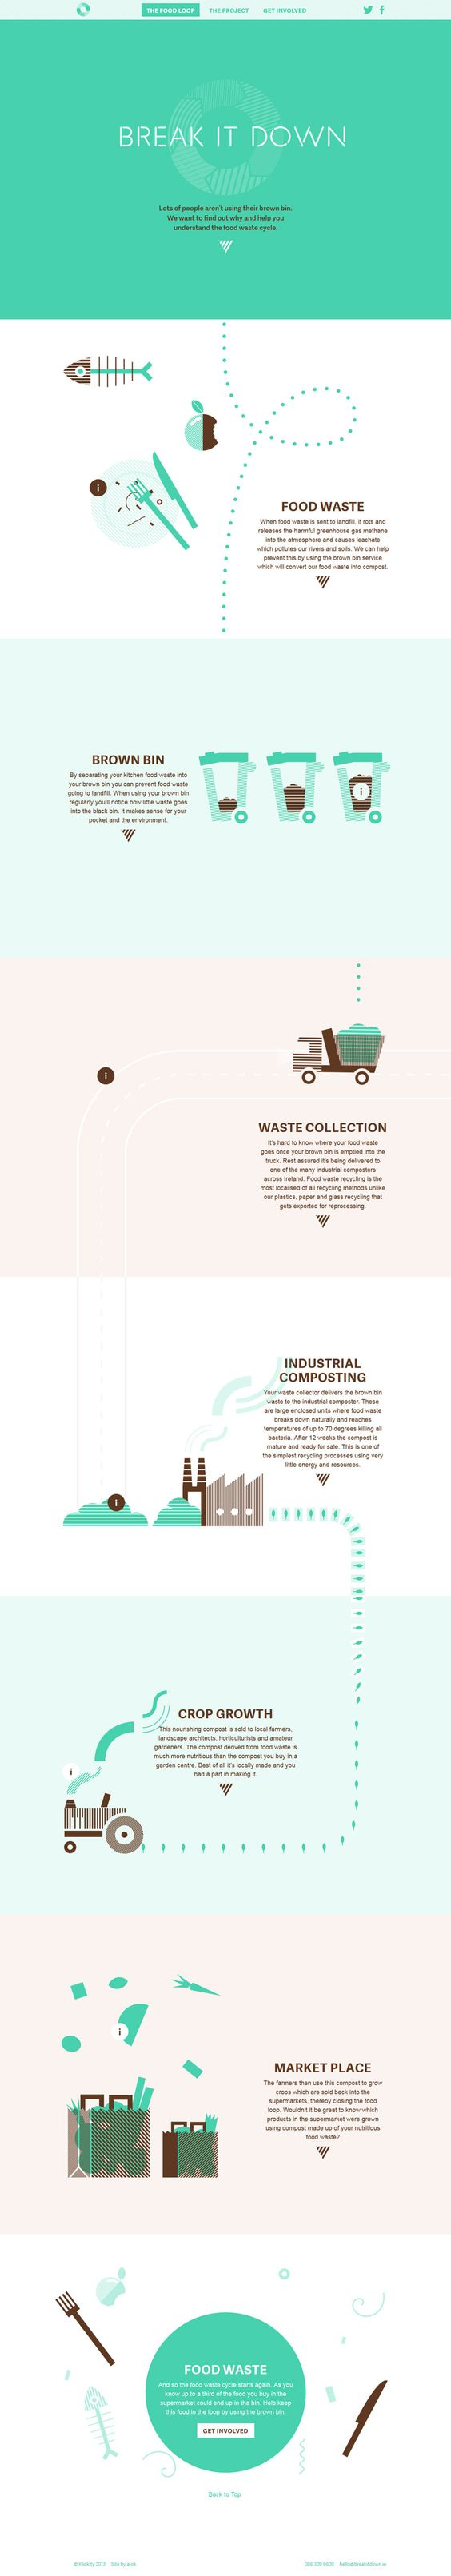 Break It Down, flat, design, web, recycling. one page, illustrations, digital